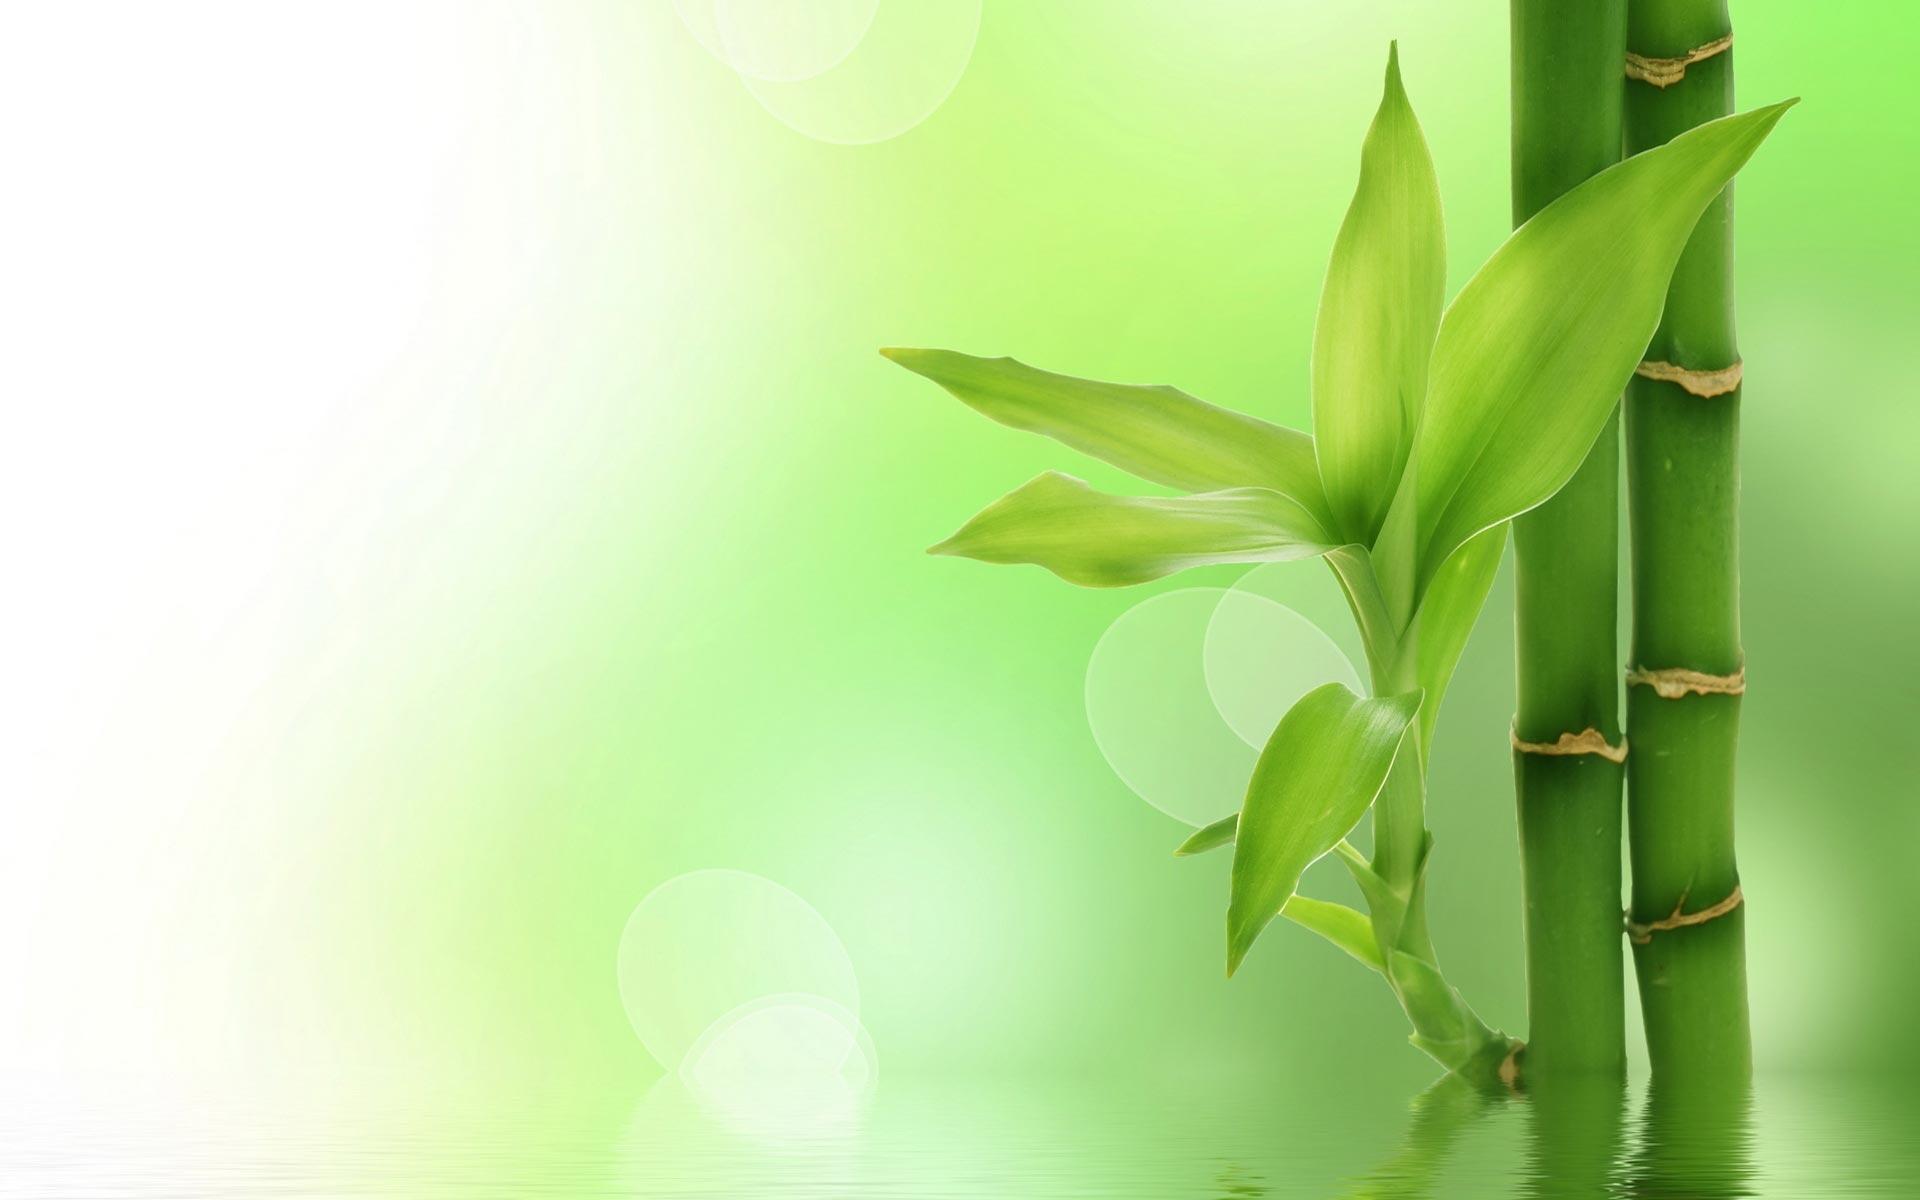 bamboo wallpaper - sf wallpaper